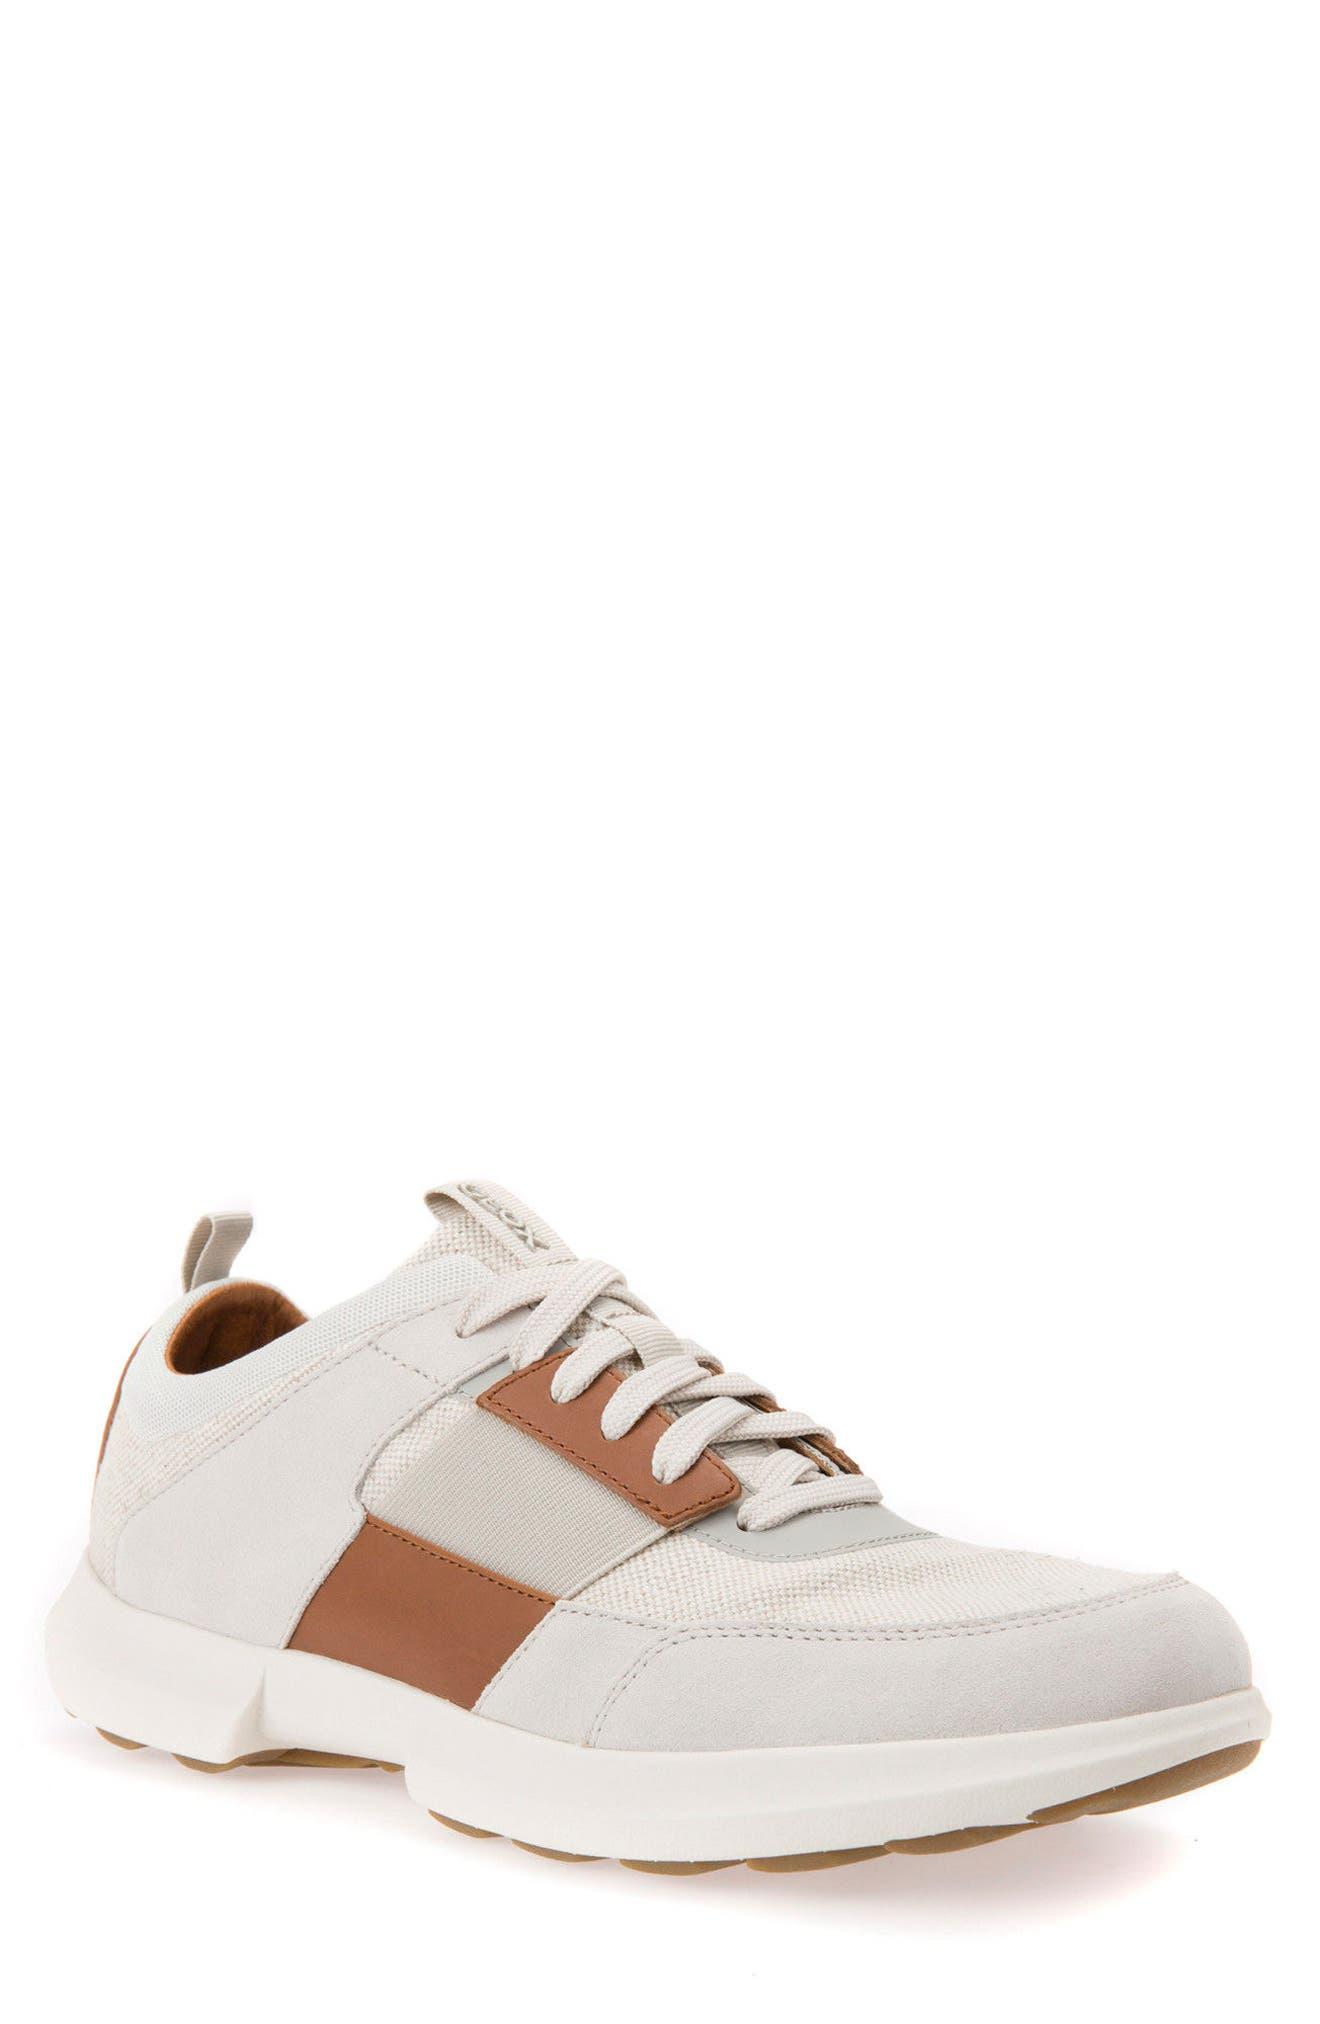 Traccia 7 Sneaker,                             Main thumbnail 1, color,                             PAPYRUS